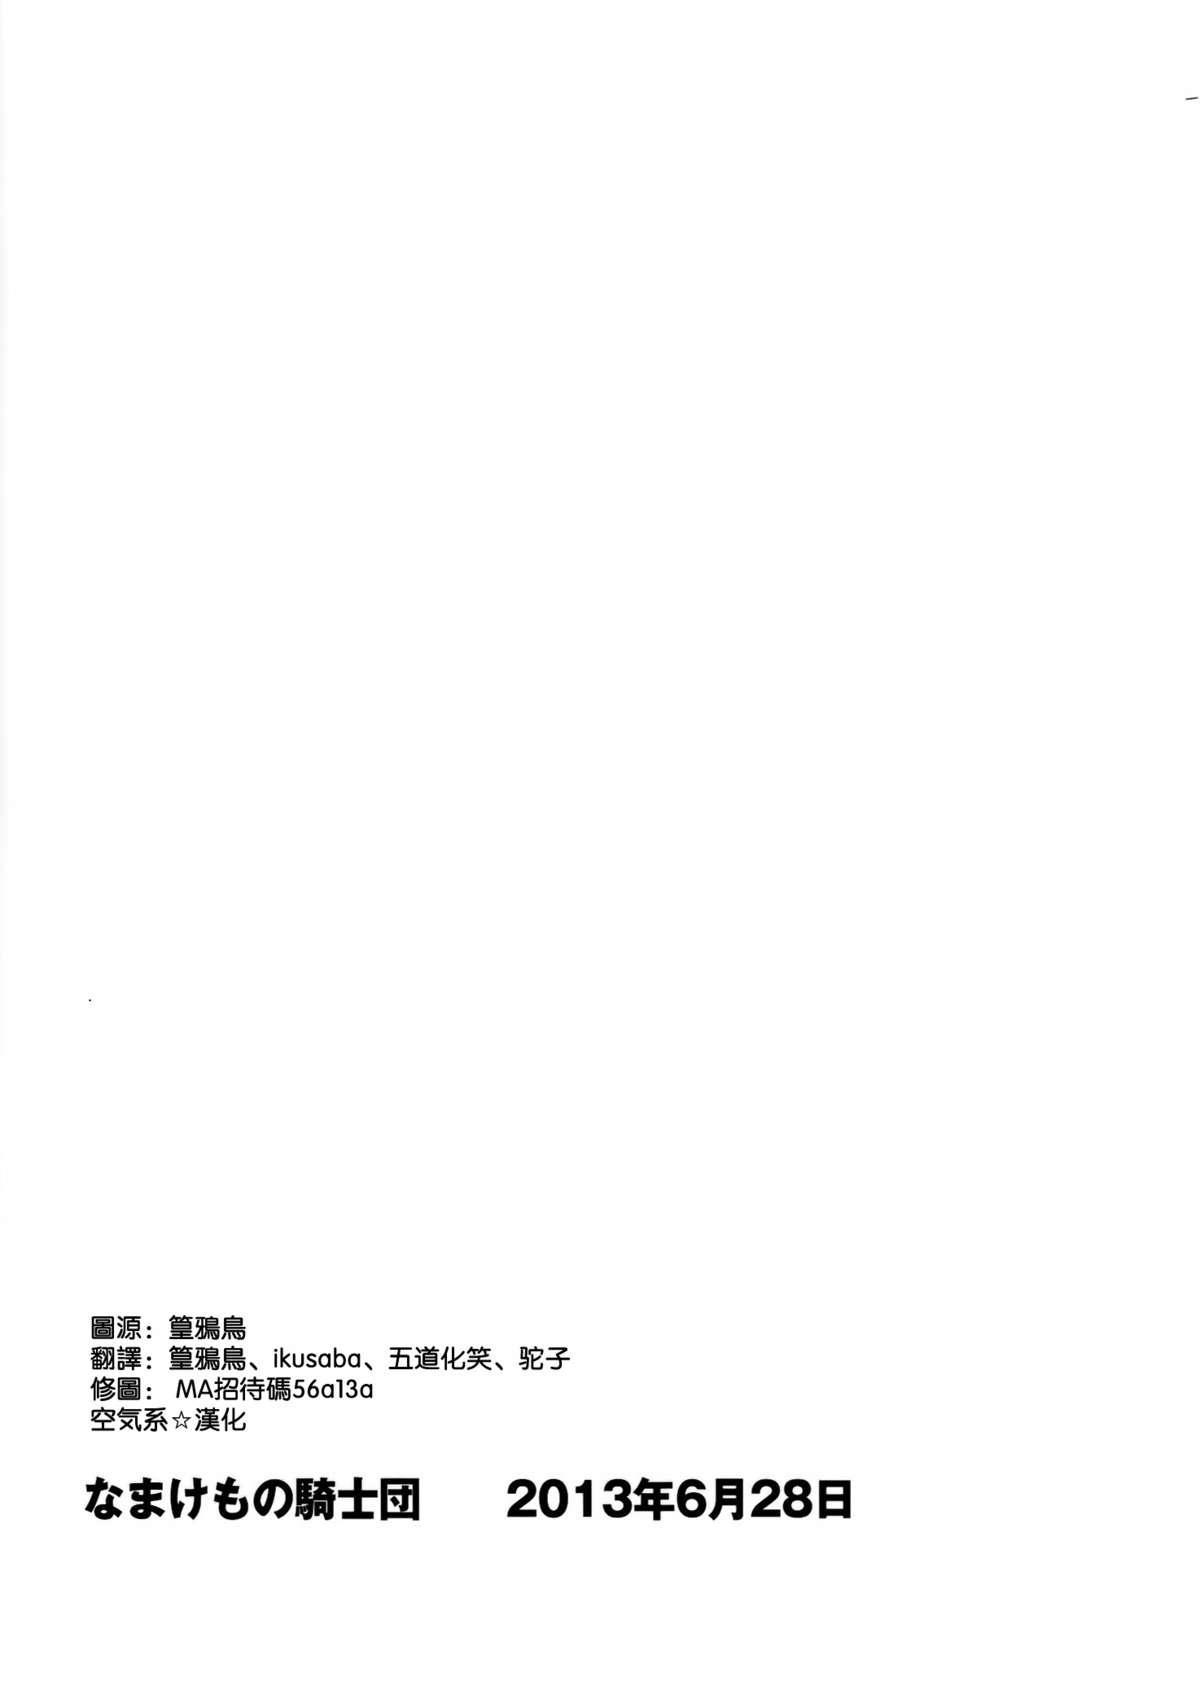 UnSweet Haha Wakui Kazumi Plus SIDE Hitori Musuko Ryousuke   Unsweet Mom Aimi Wakui - SIDE her only son Yoshisuke 1